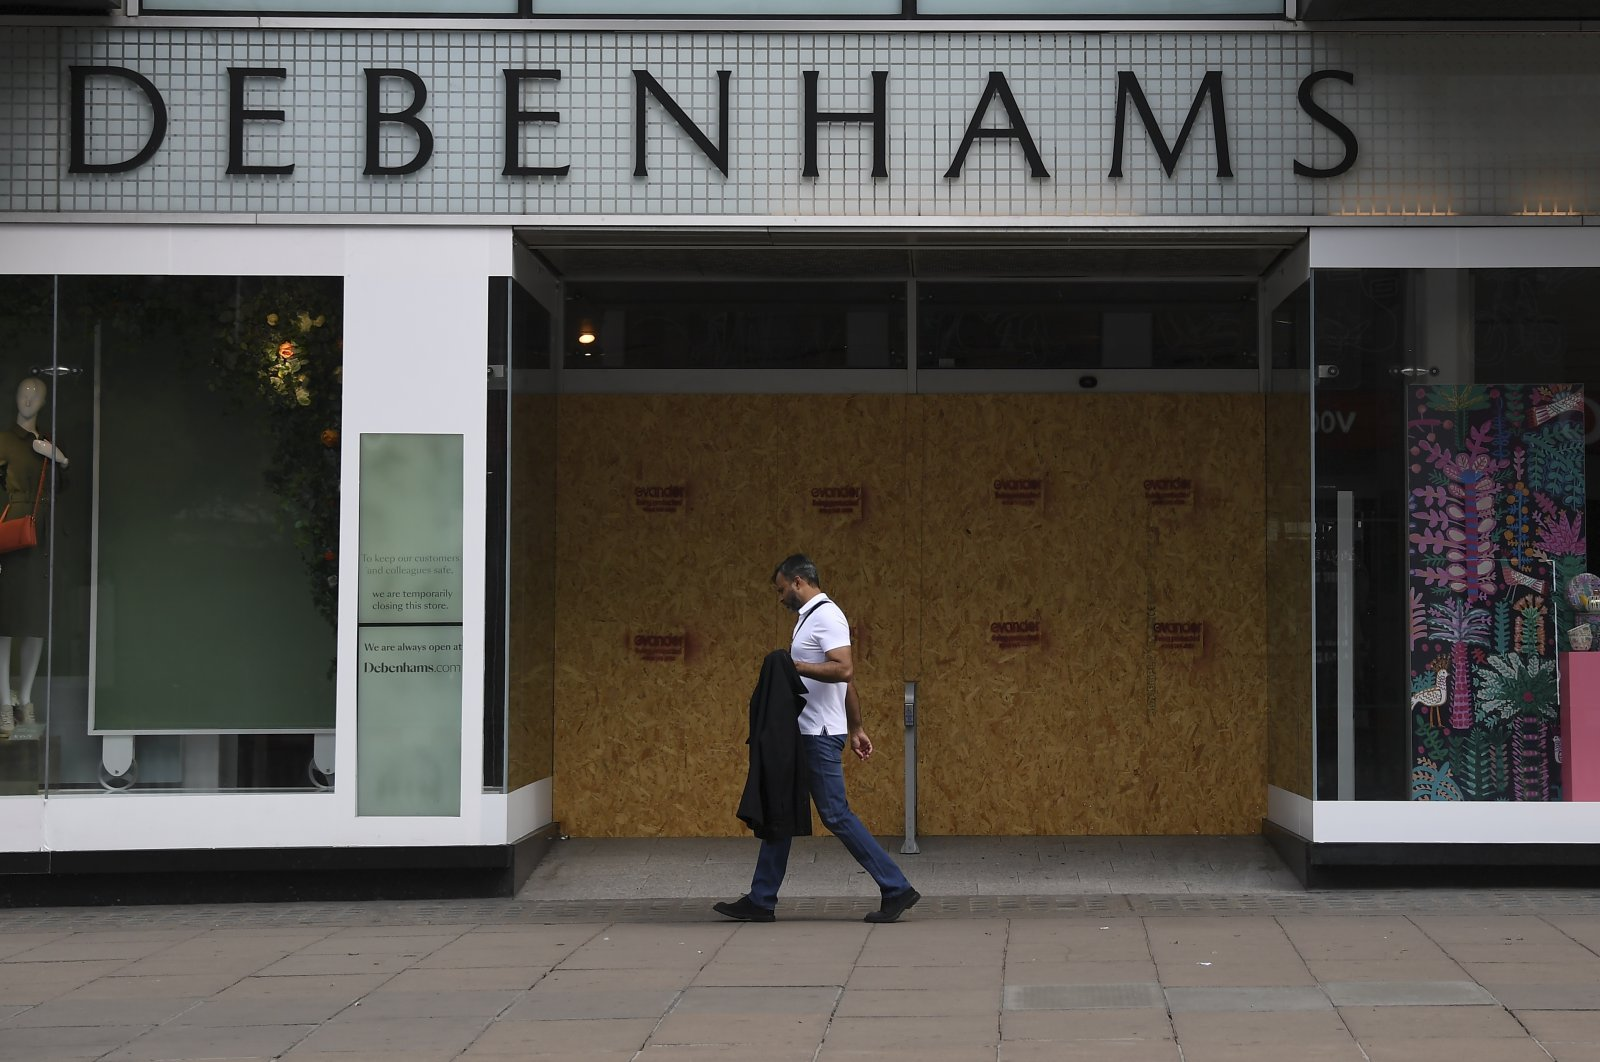 A man walks past a Debenhams store in the main shopping street Oxford Street, London, U.K., June 12, 2020. (AP Photo)